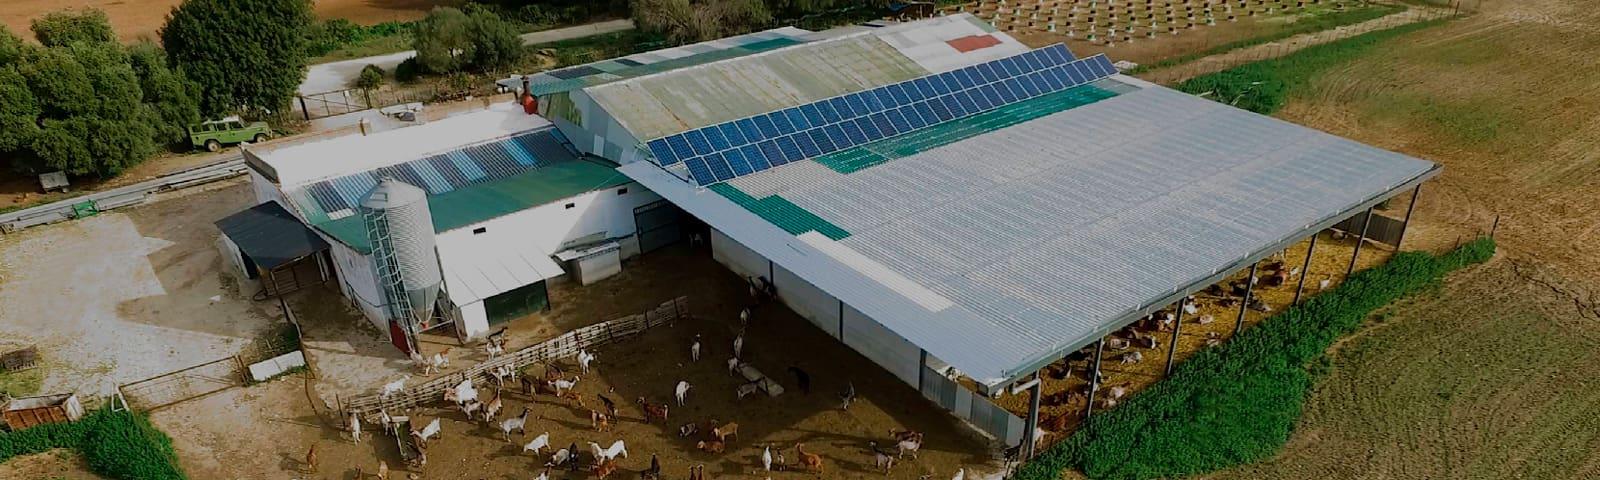 Bombeo Solar Fotovoltaico - Empresas de Autoconsumo Fotovoltaico